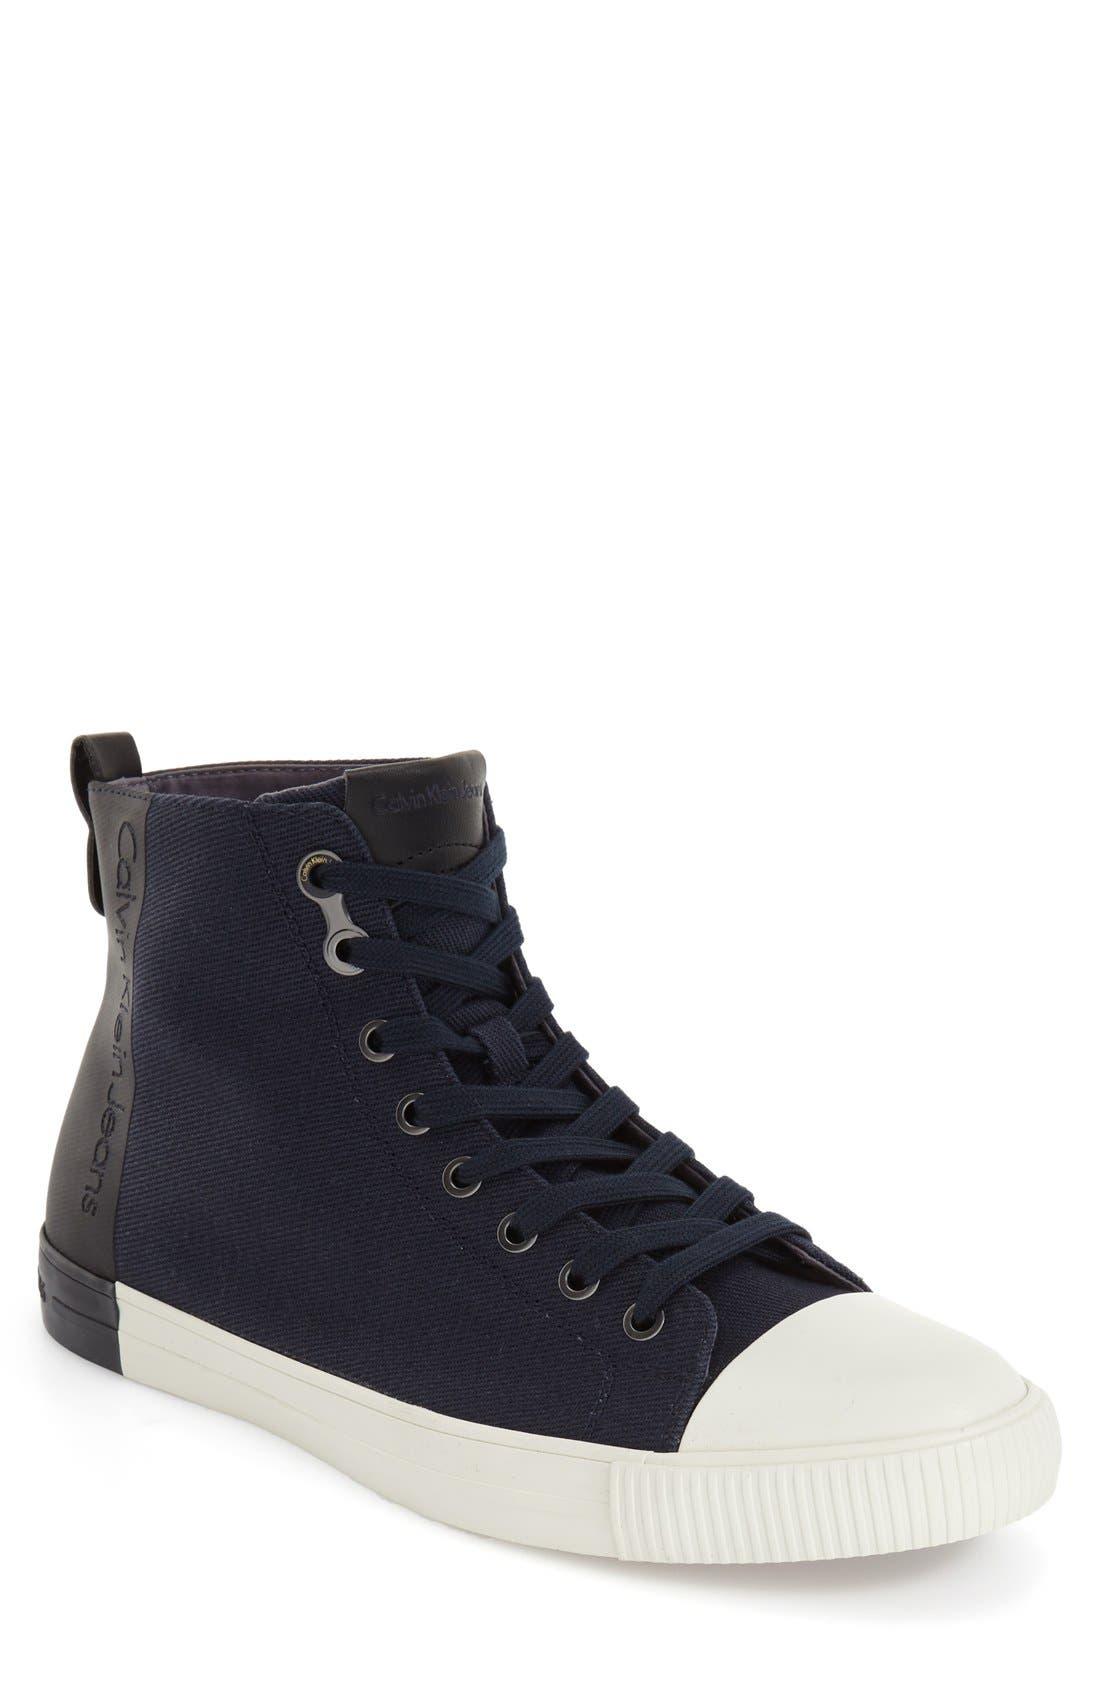 CALVIN KLEIN JEANS 'Arnaud' Sneaker